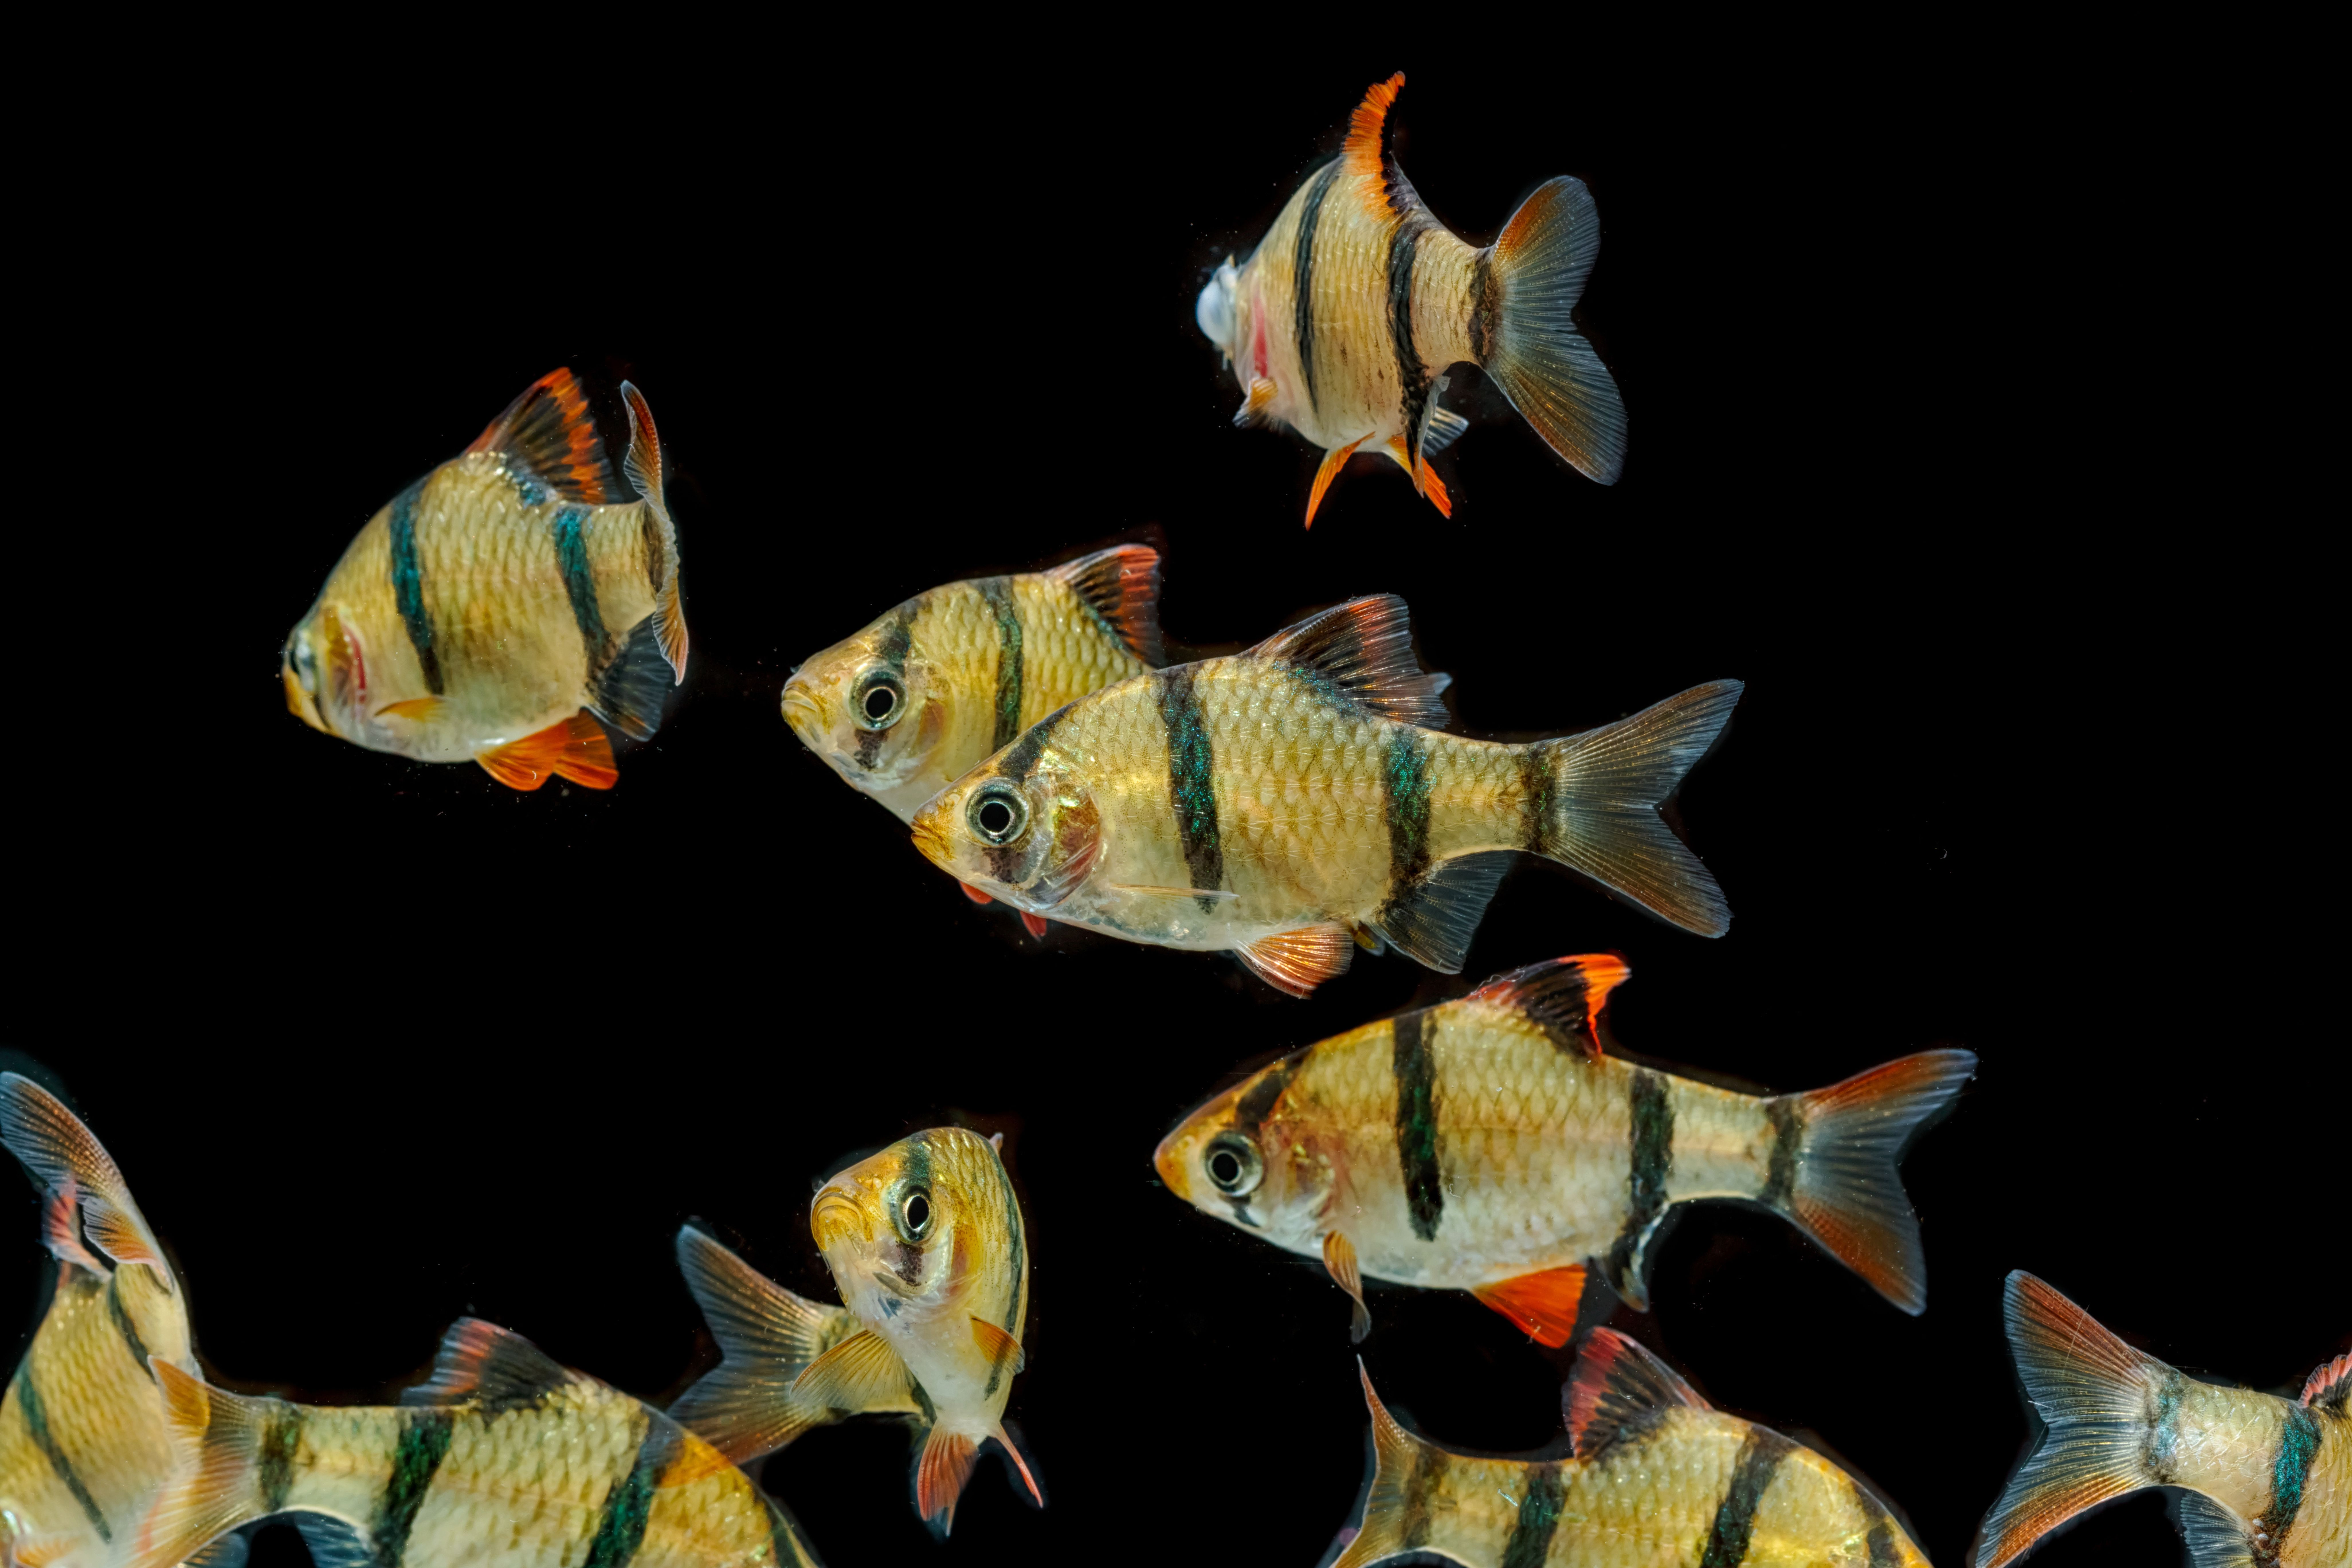 Tiger Barb Feeding Guide Tiger Fish Tropical Fish Aquarium Fish Tank